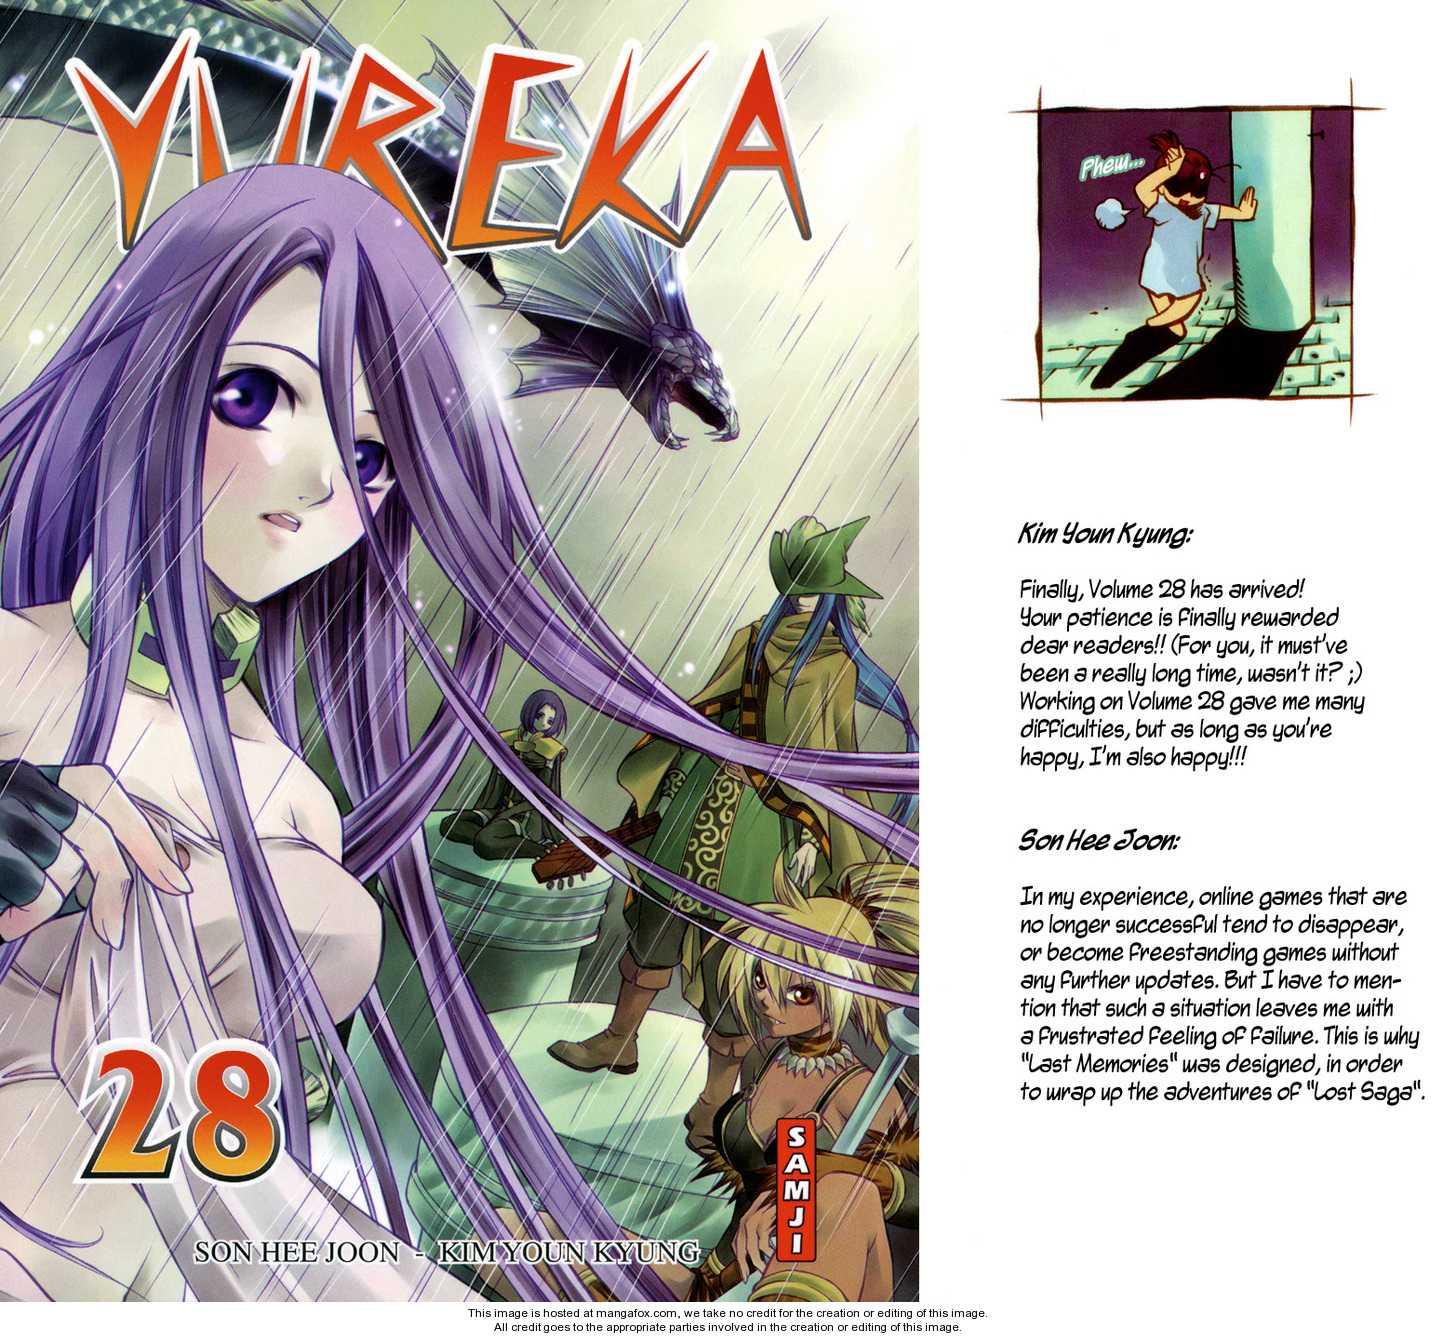 Yureka 168 Page 2